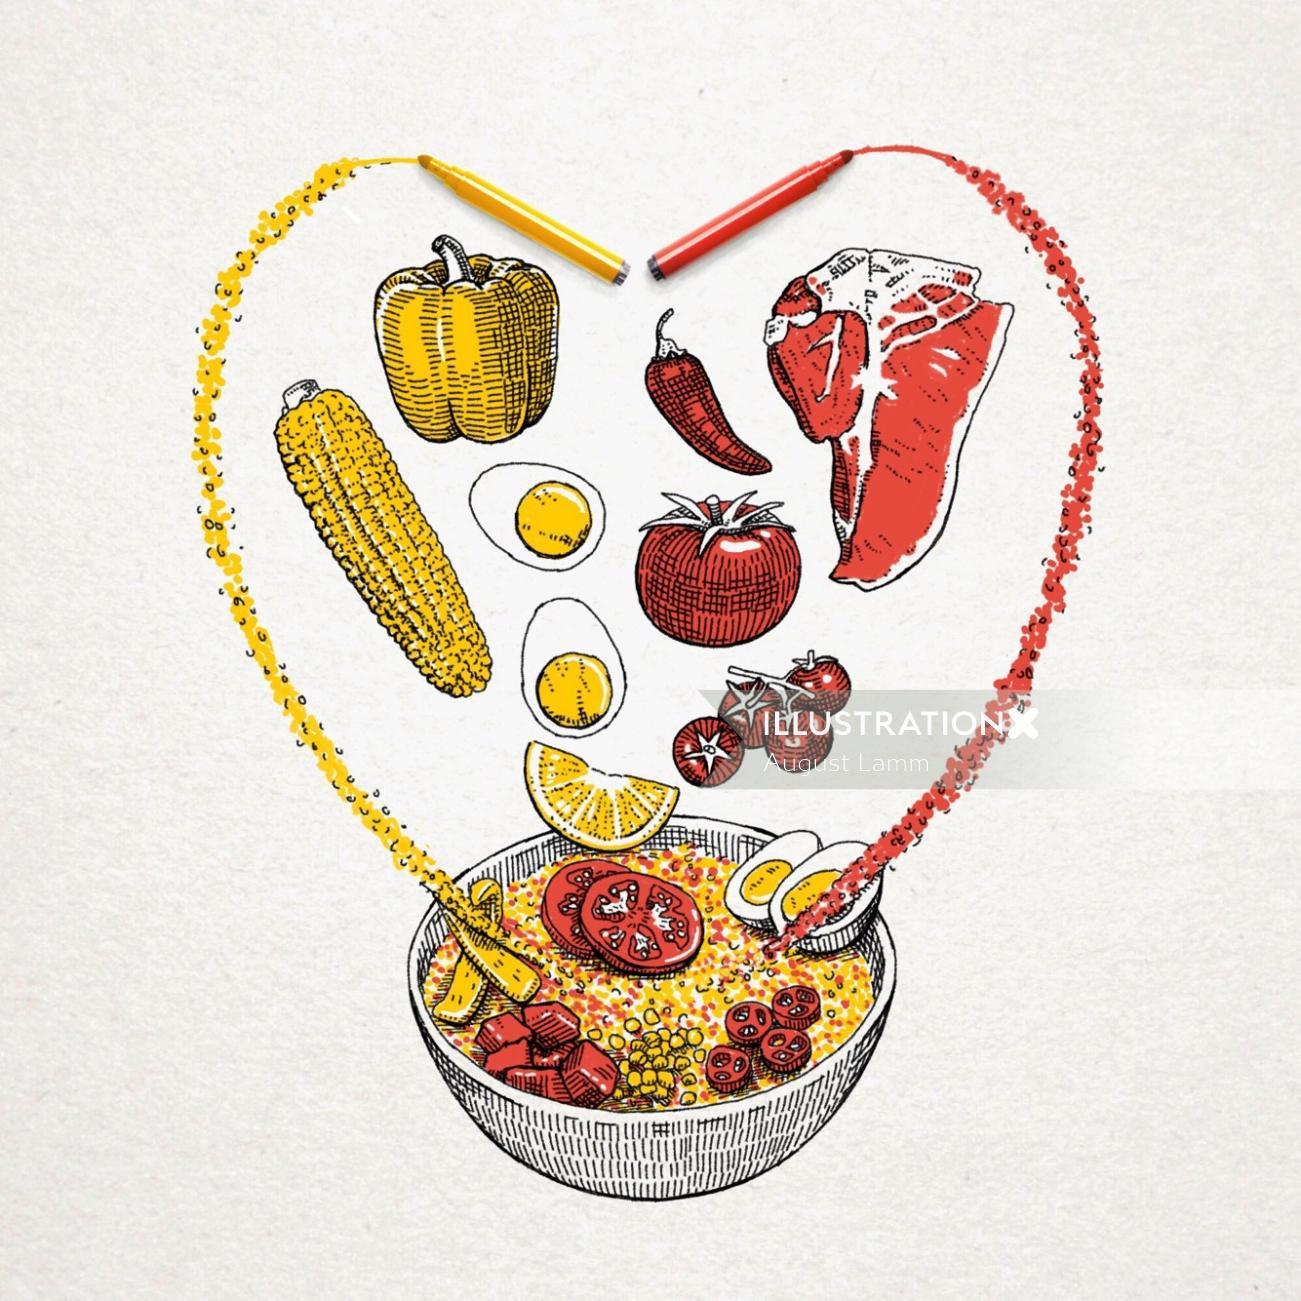 Food illustration for spanish rice company